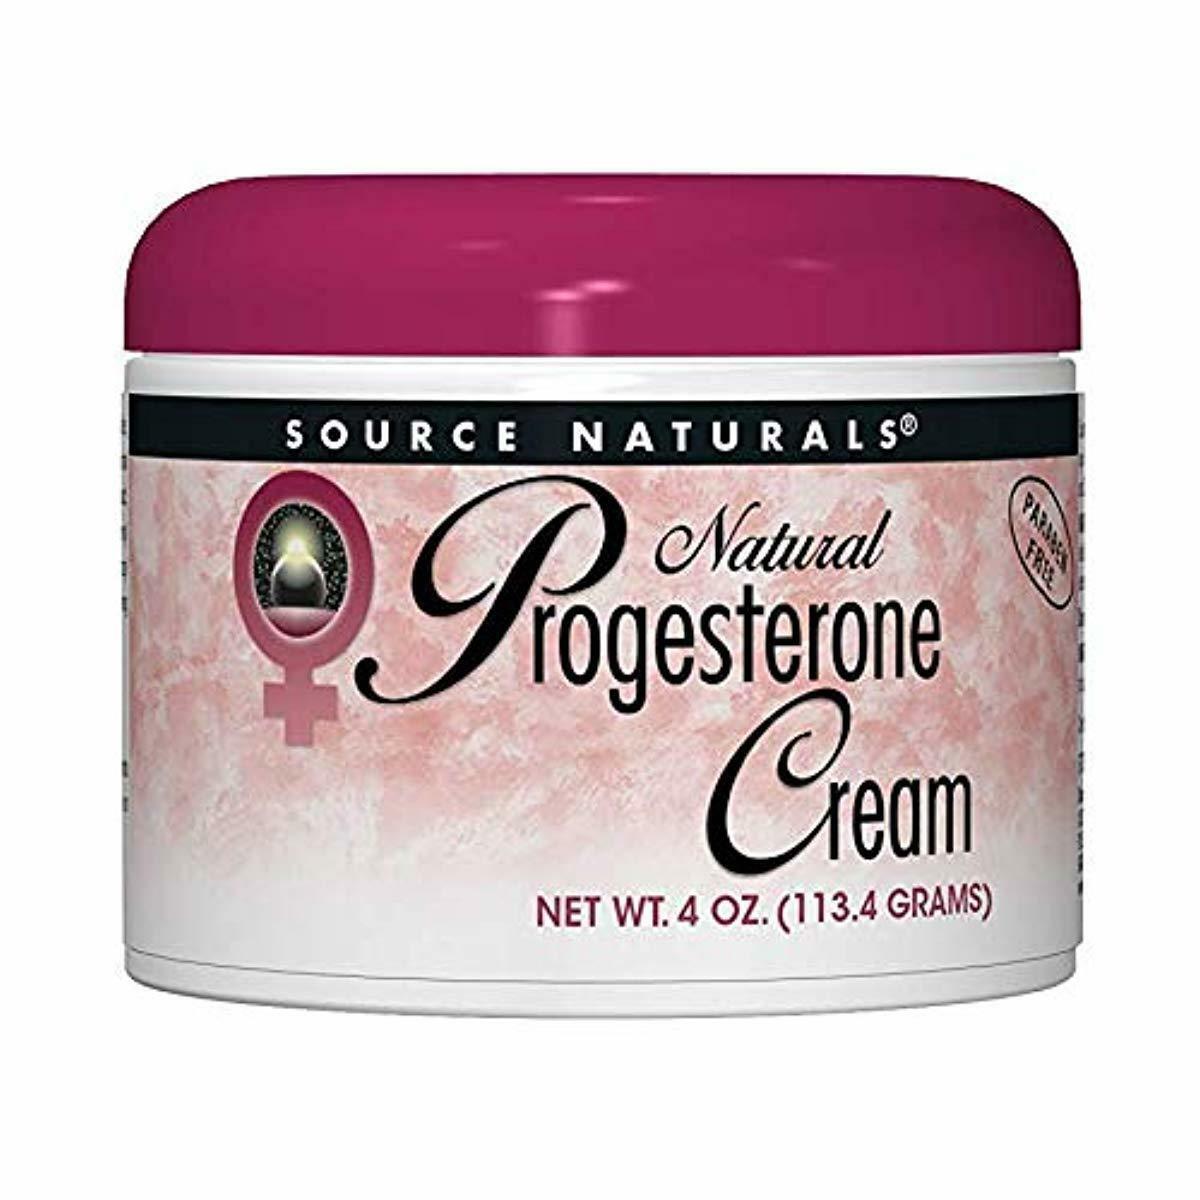 Source Naturals Progesterone Cream - Women's Health Support